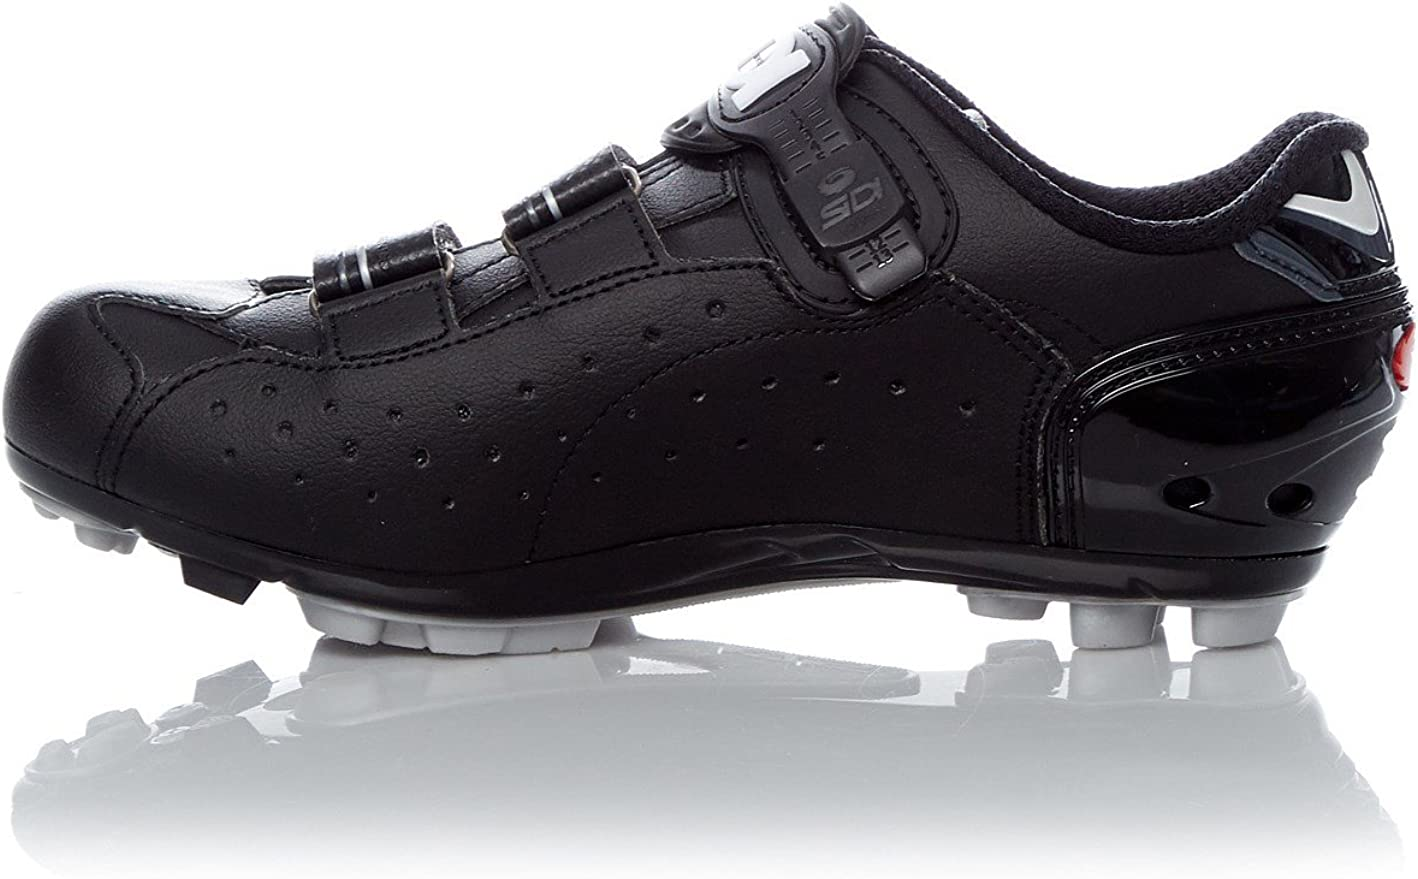 44 Noir Sidi Chaussures VTT Dominator 7 Mega